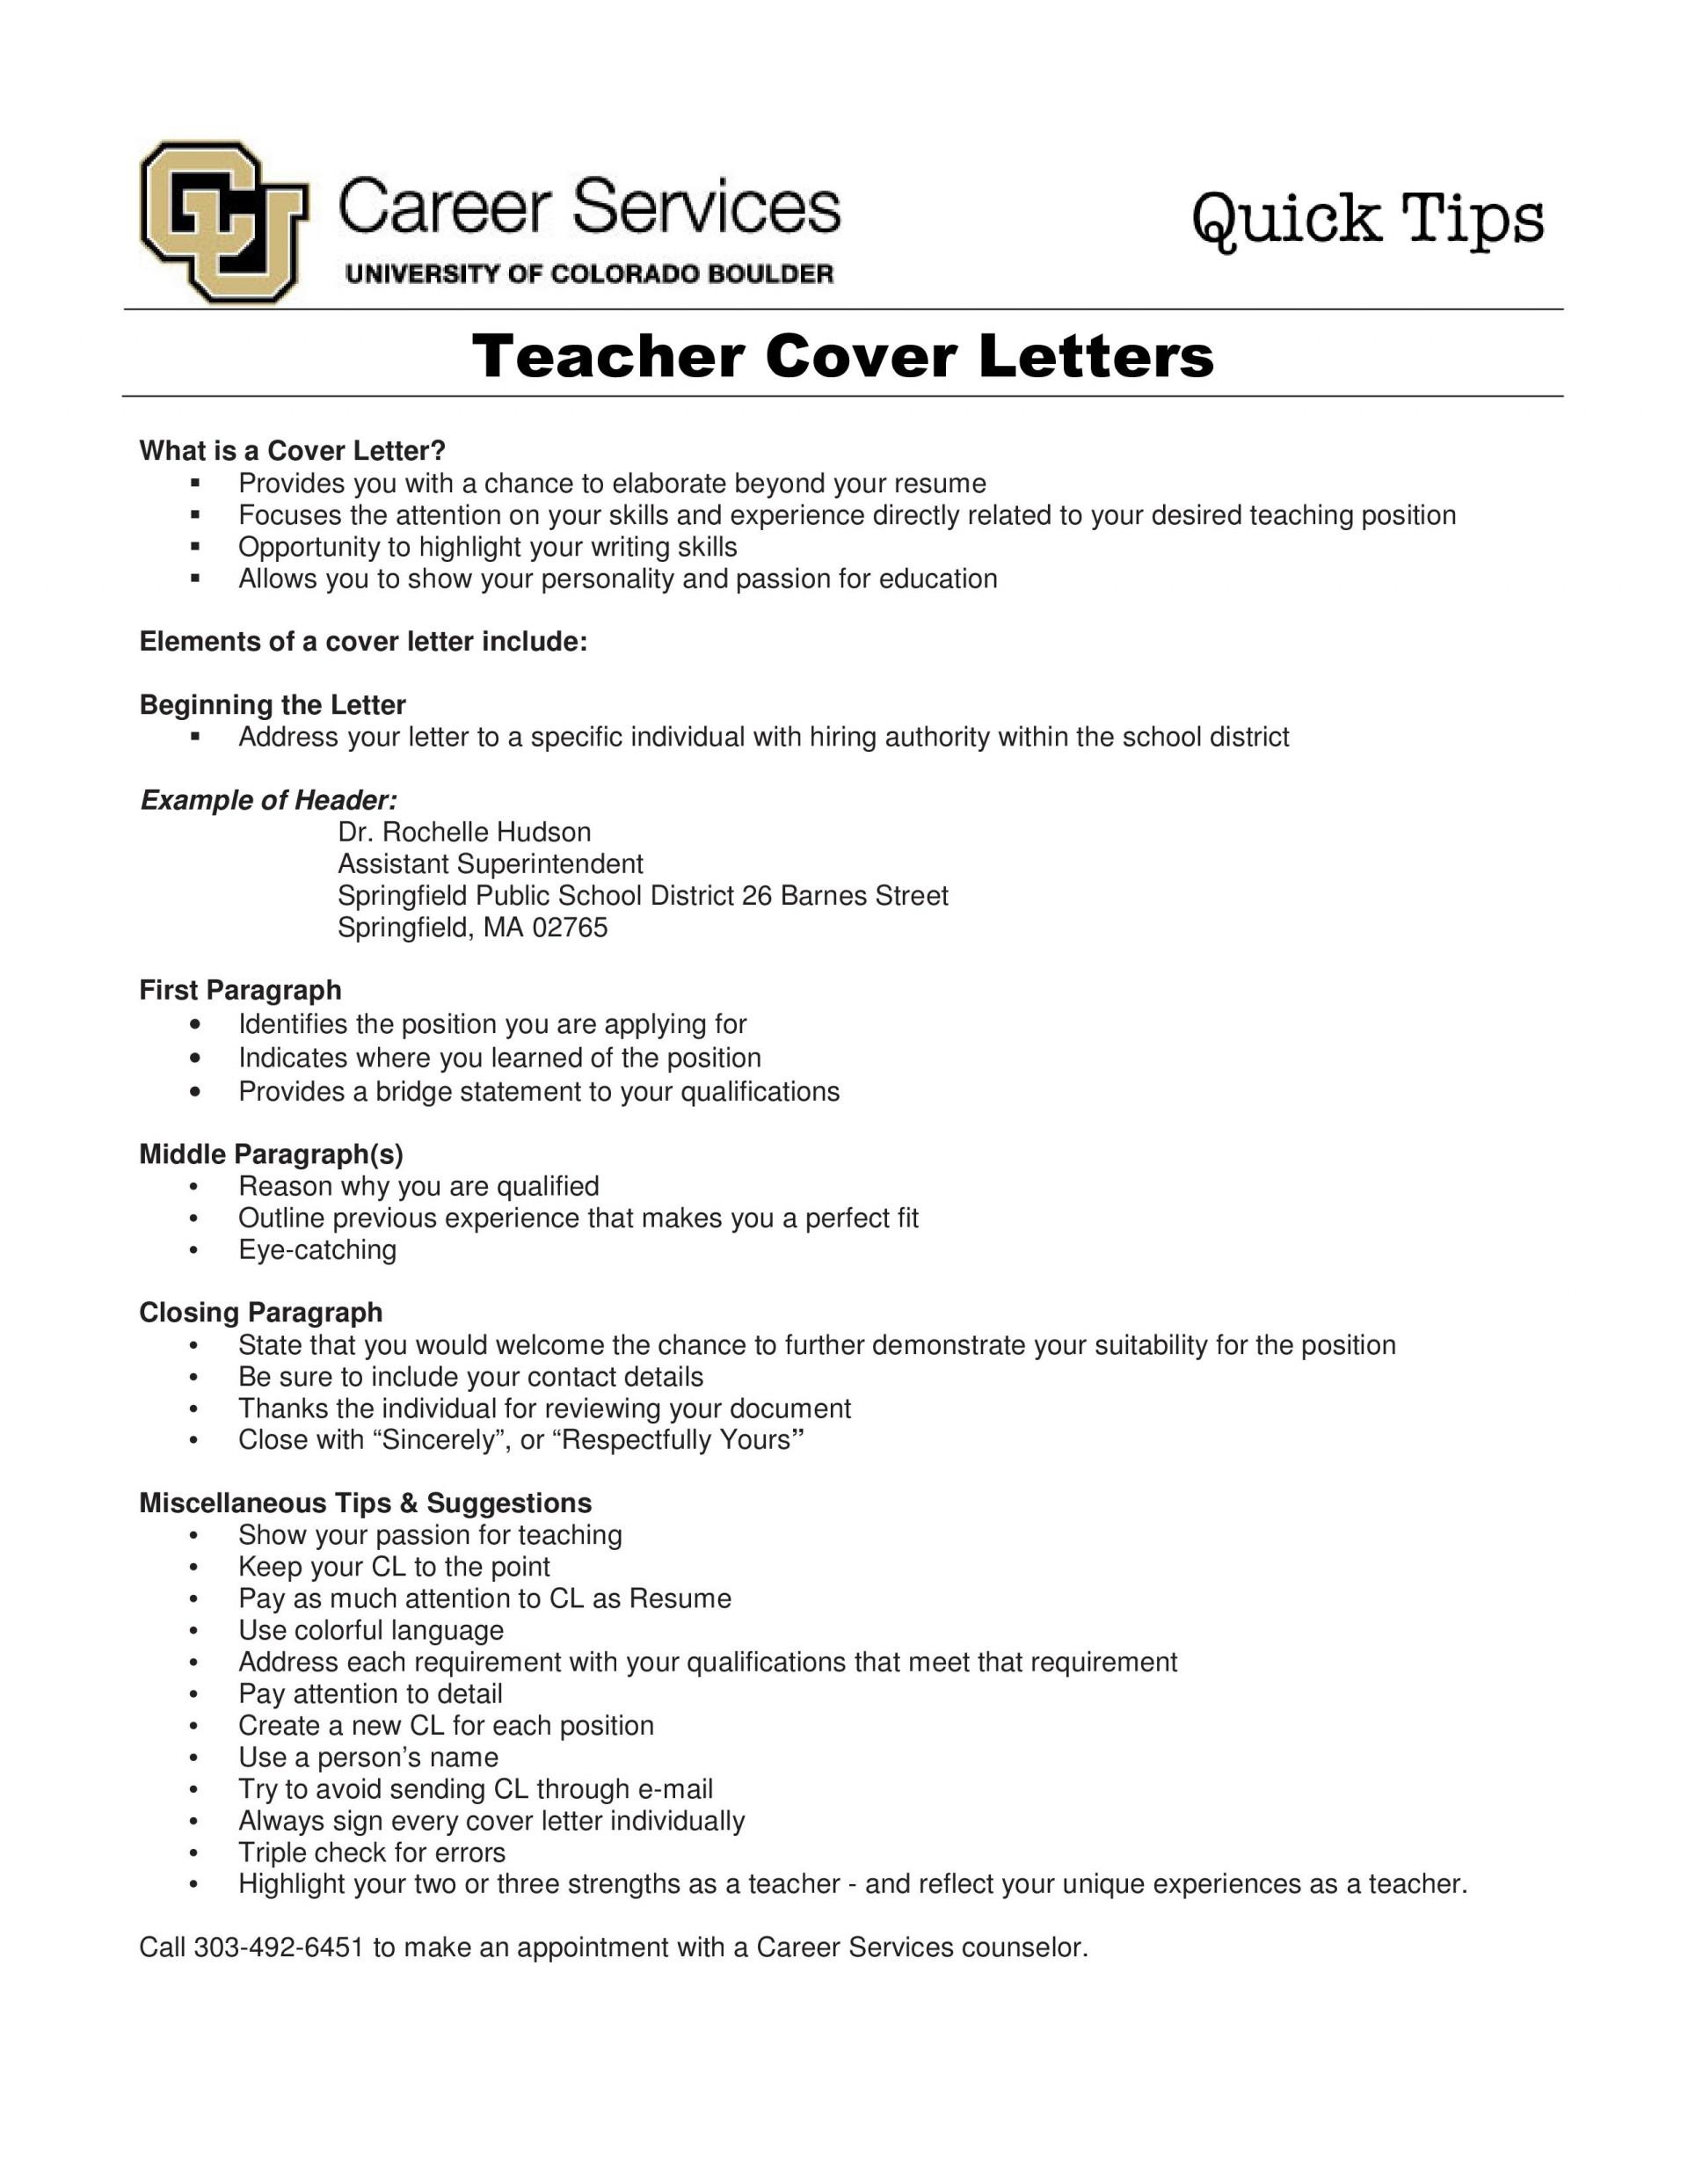 000 Wonderful Teacher Cover Letter Template Idea  Teaching Job1920